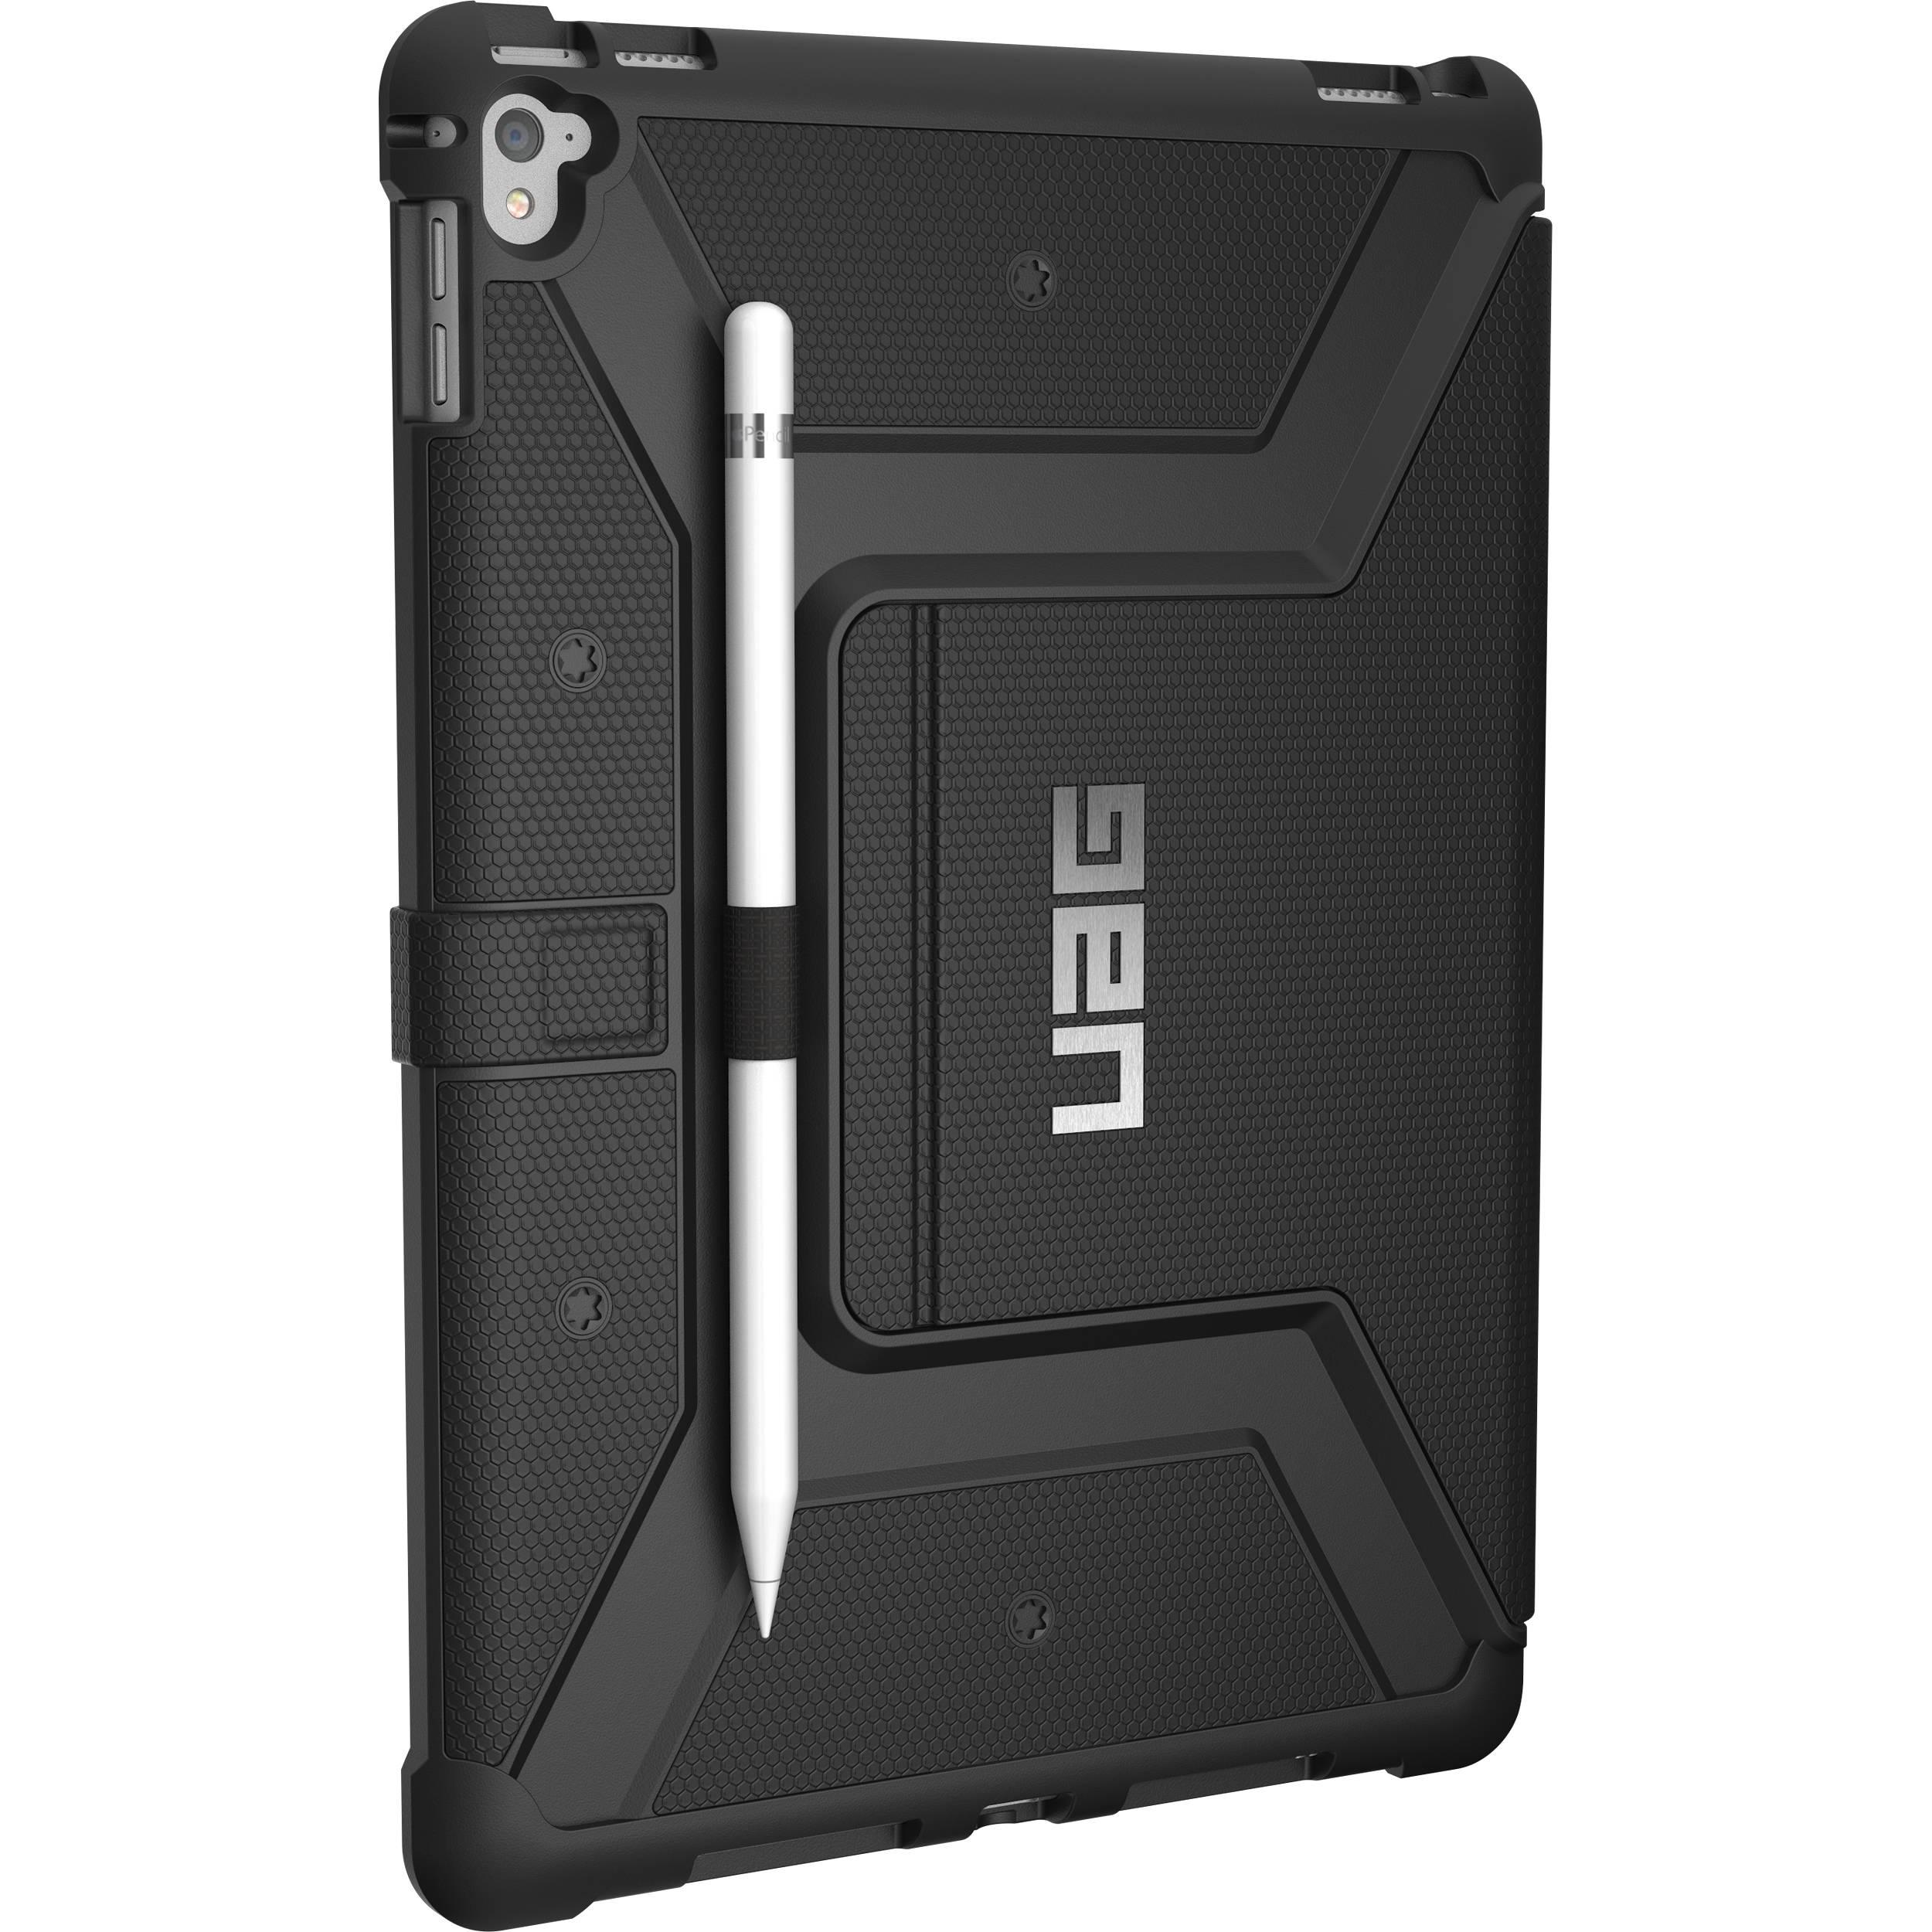 huge discount a25ec c9e27 Urban Armor Gear iPad Pro 9.7